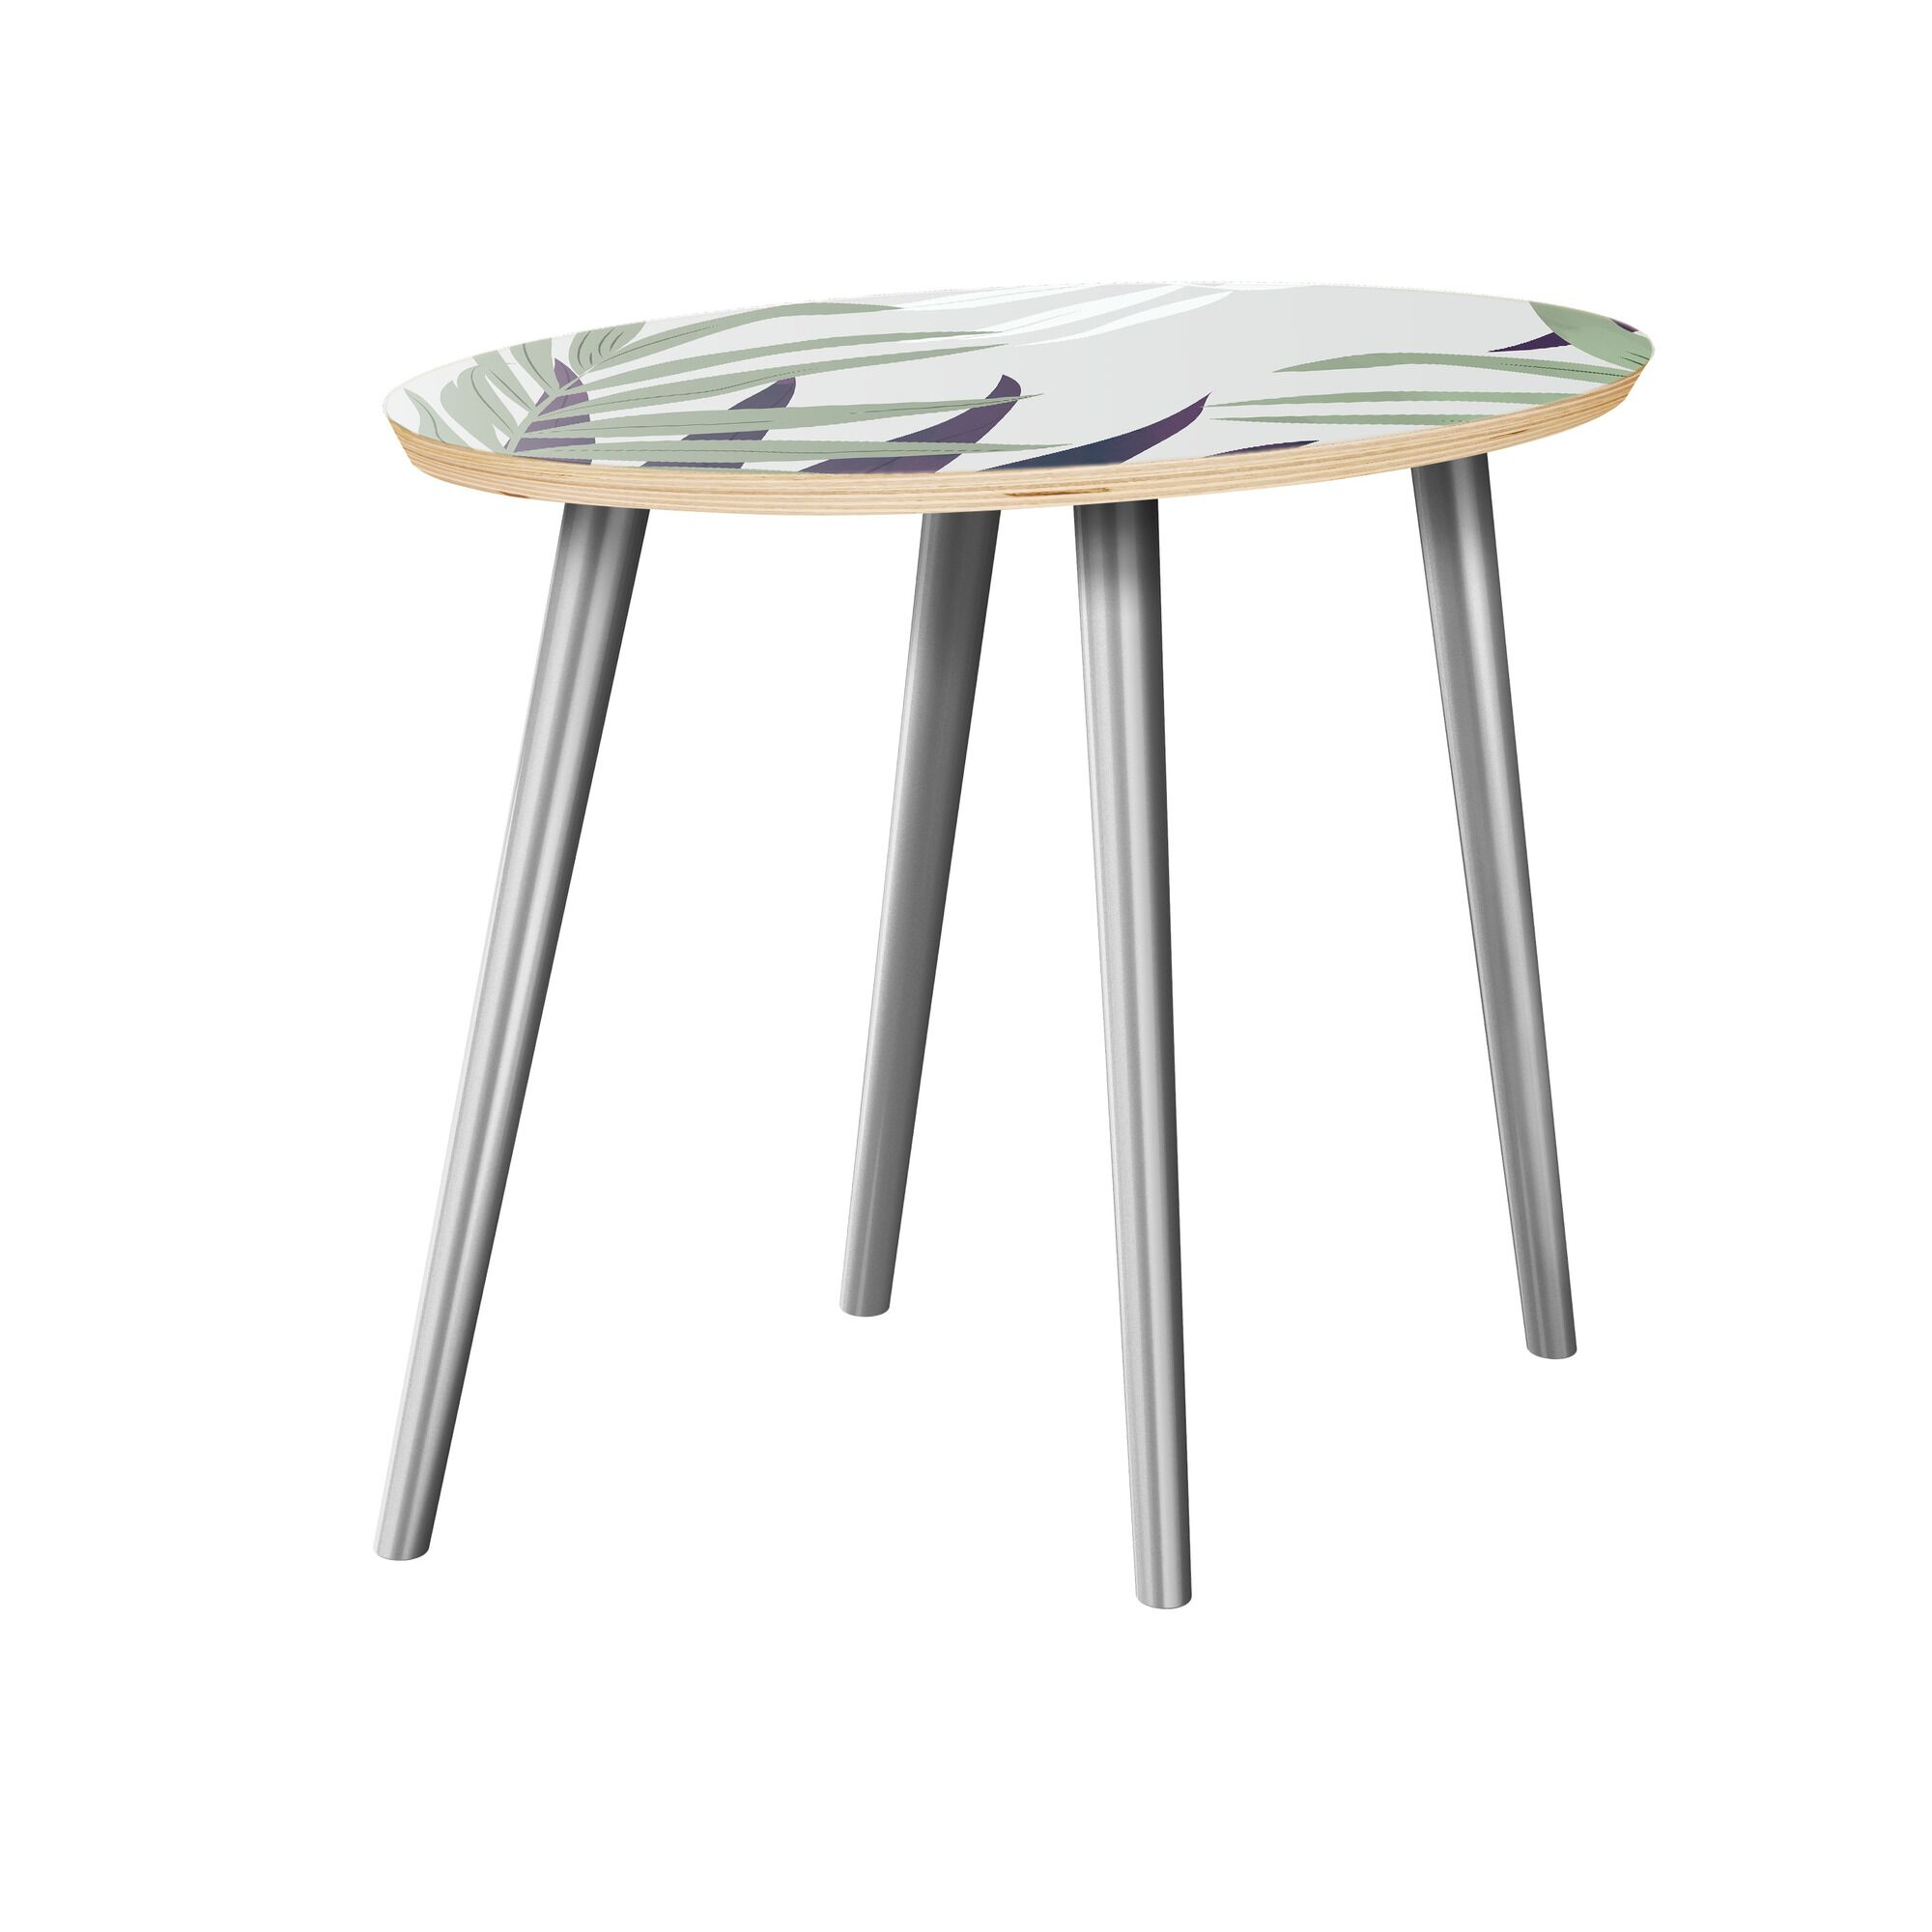 Koutio End Table Table Top Color: Natural, Table Base Color: Chrome